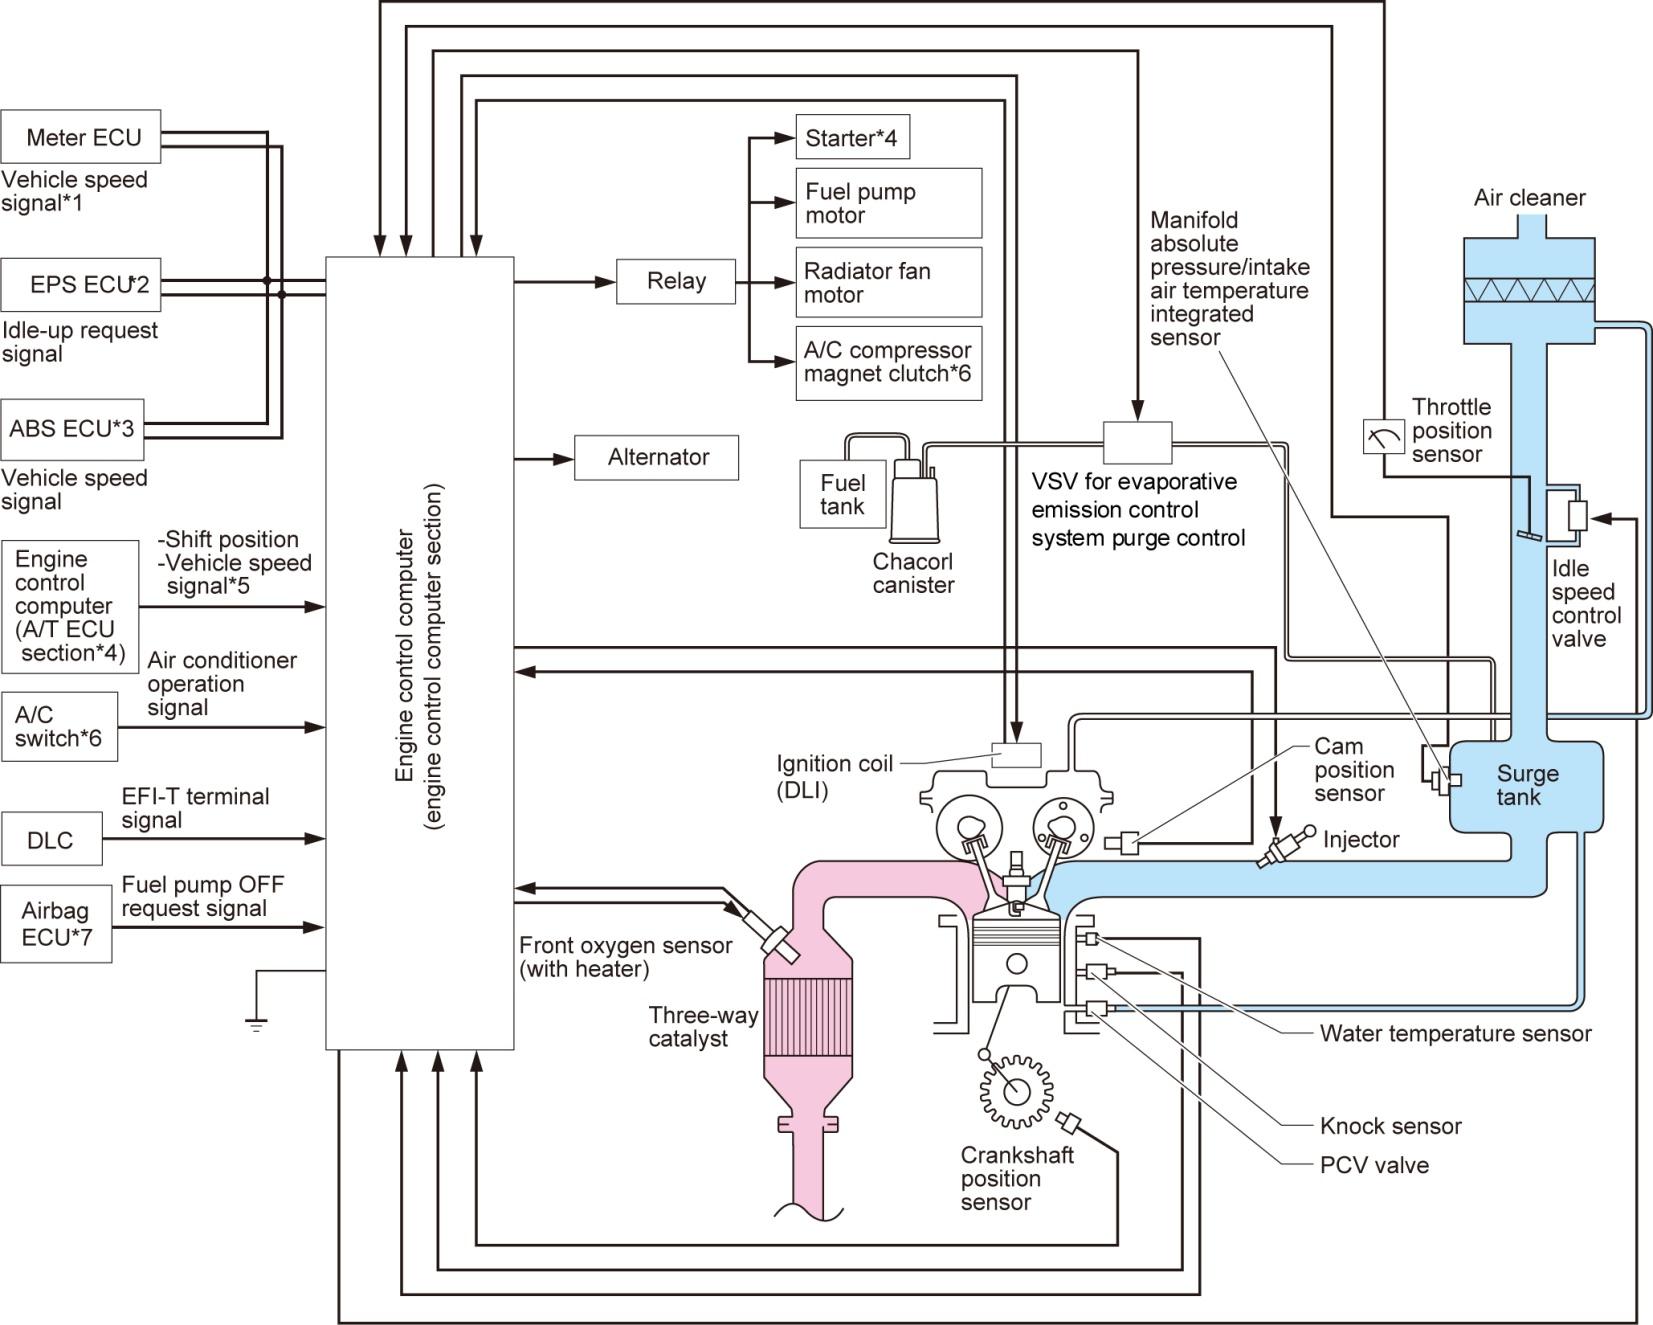 Wiring diagram daihatsu ayla wiring diagram kisi kisi lks bidang lomba automobile technology lks smk propinsi ford new holland wiring diagram wiring diagram daihatsu ayla asfbconference2016 Gallery